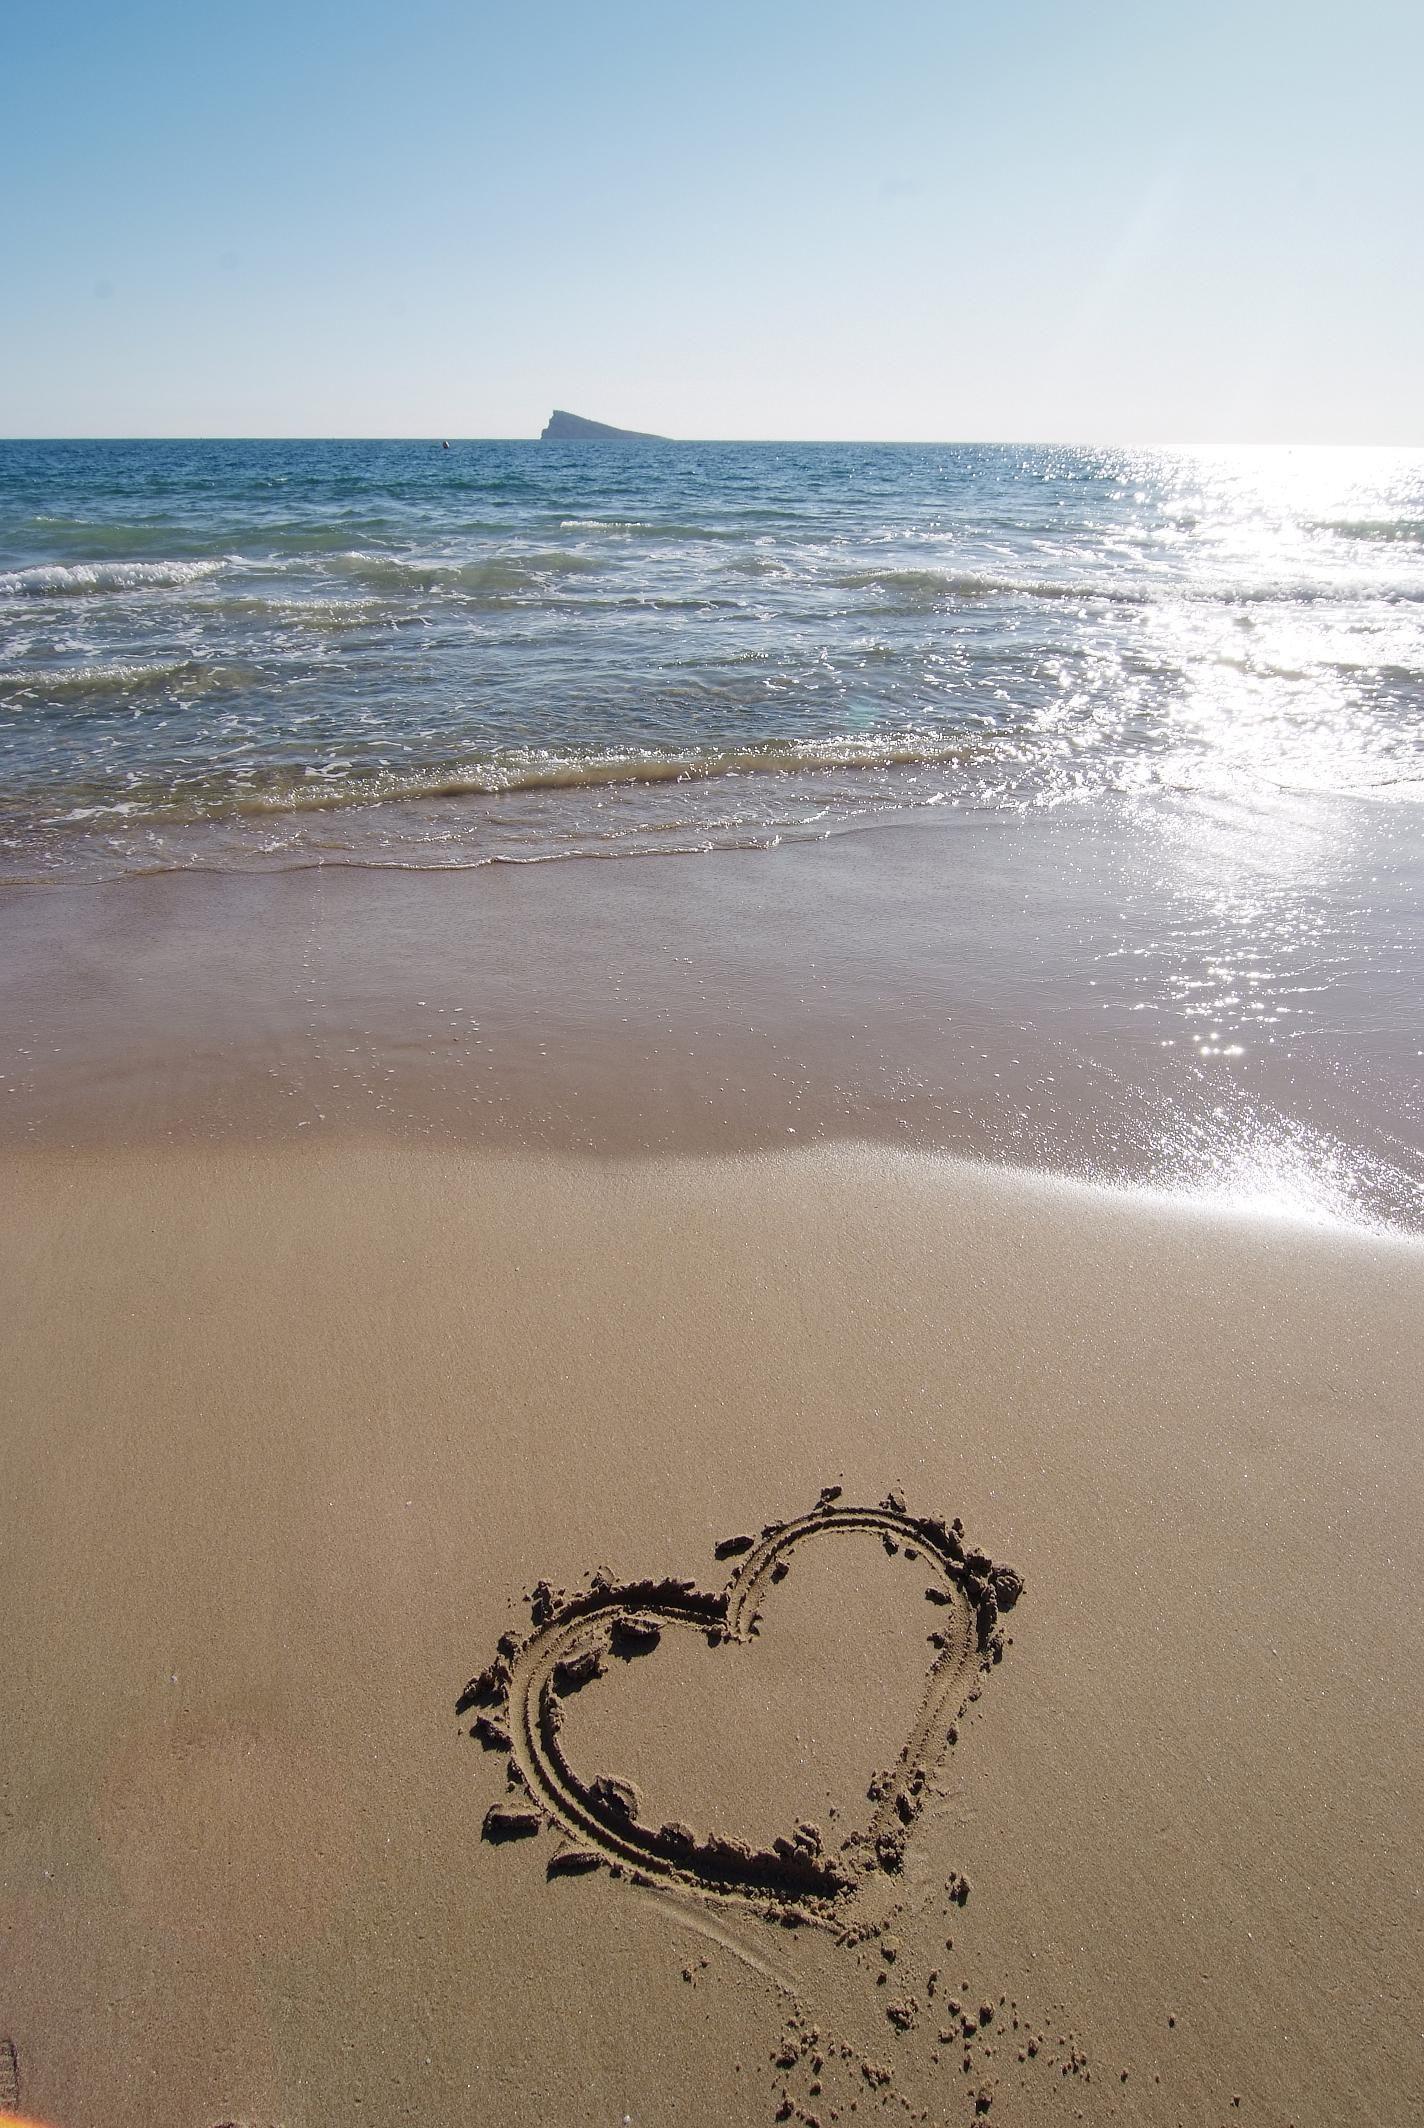 Sandos Monaco Hotel & Spa. Beach Experience #Benidorm www.sandos.com